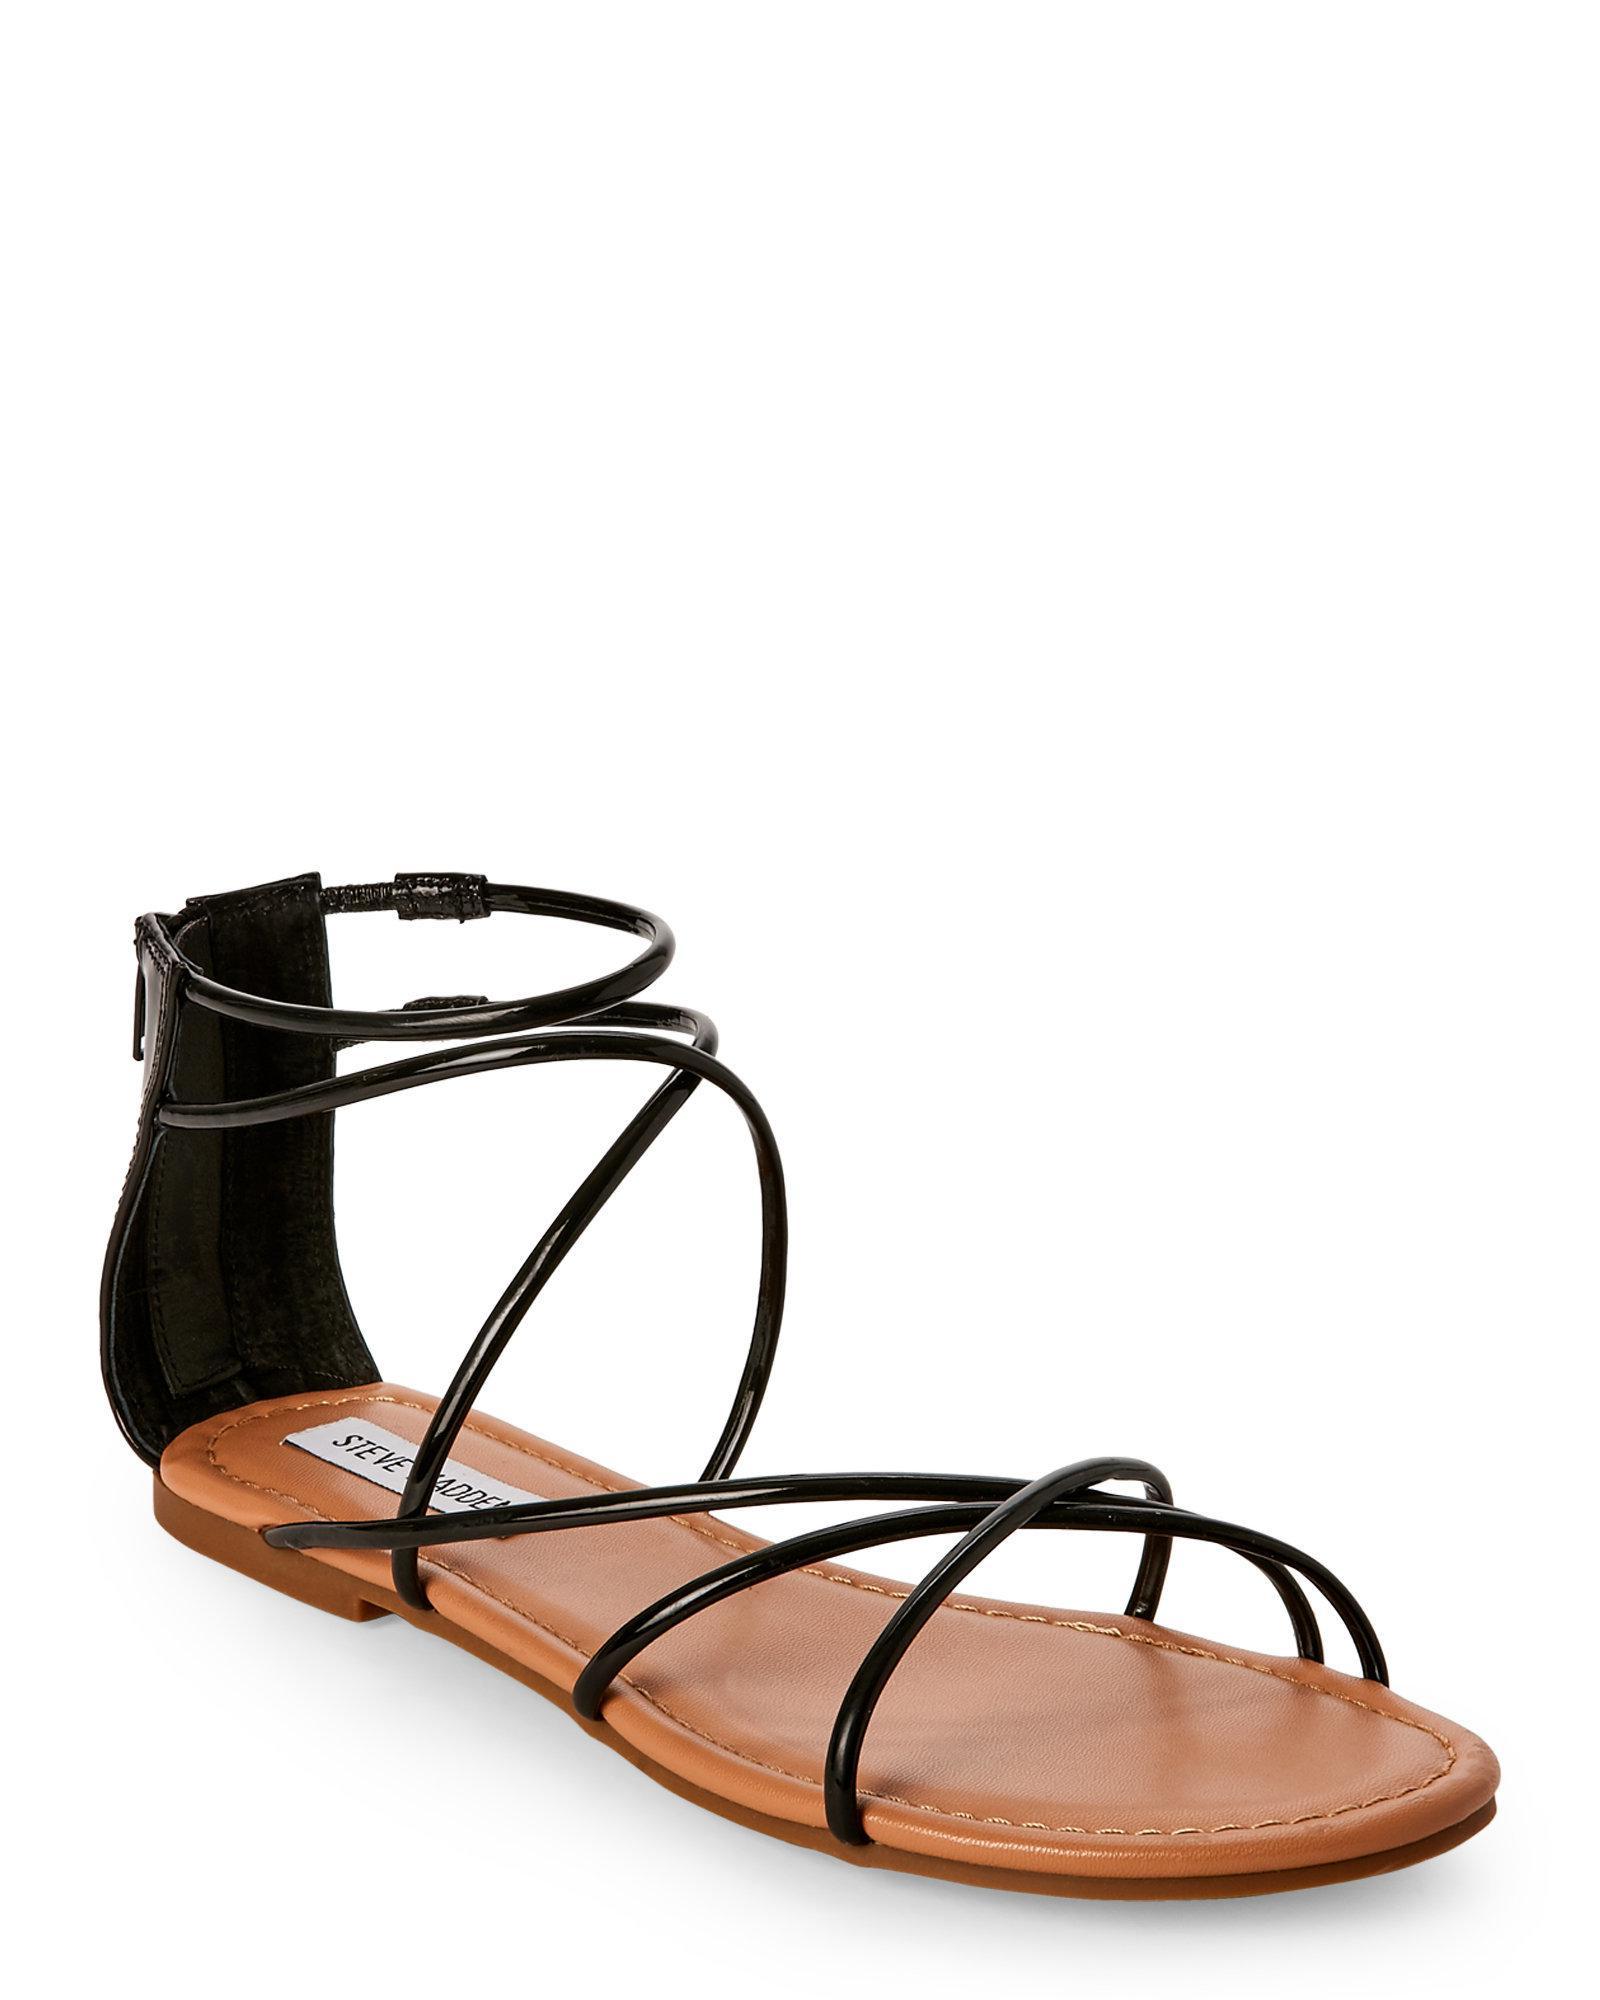 c15fd979a08 Steve Madden Black Sapphire Strappy Flat Sandals